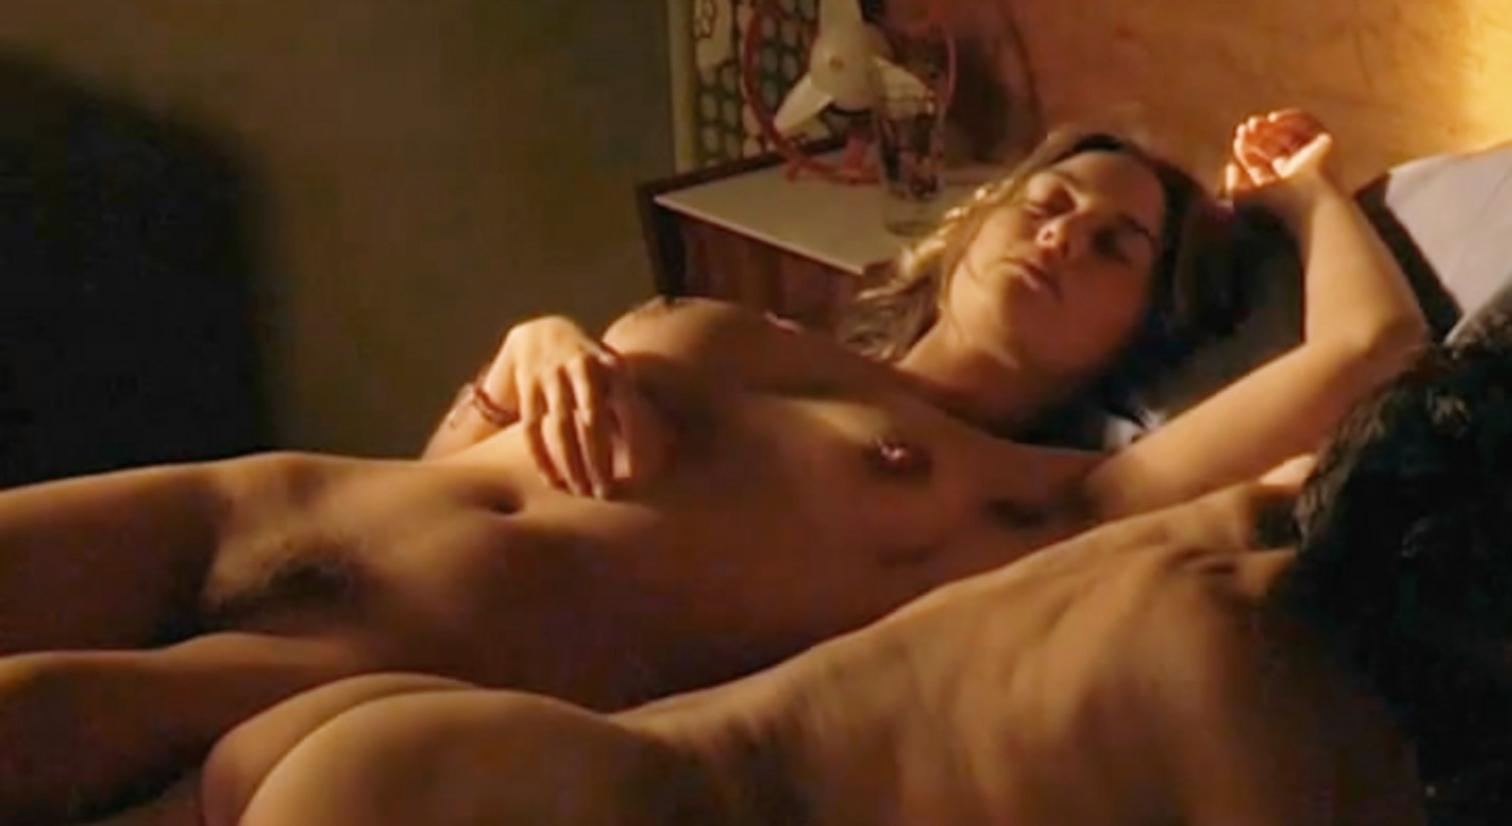 Кейт Неллиган Порно